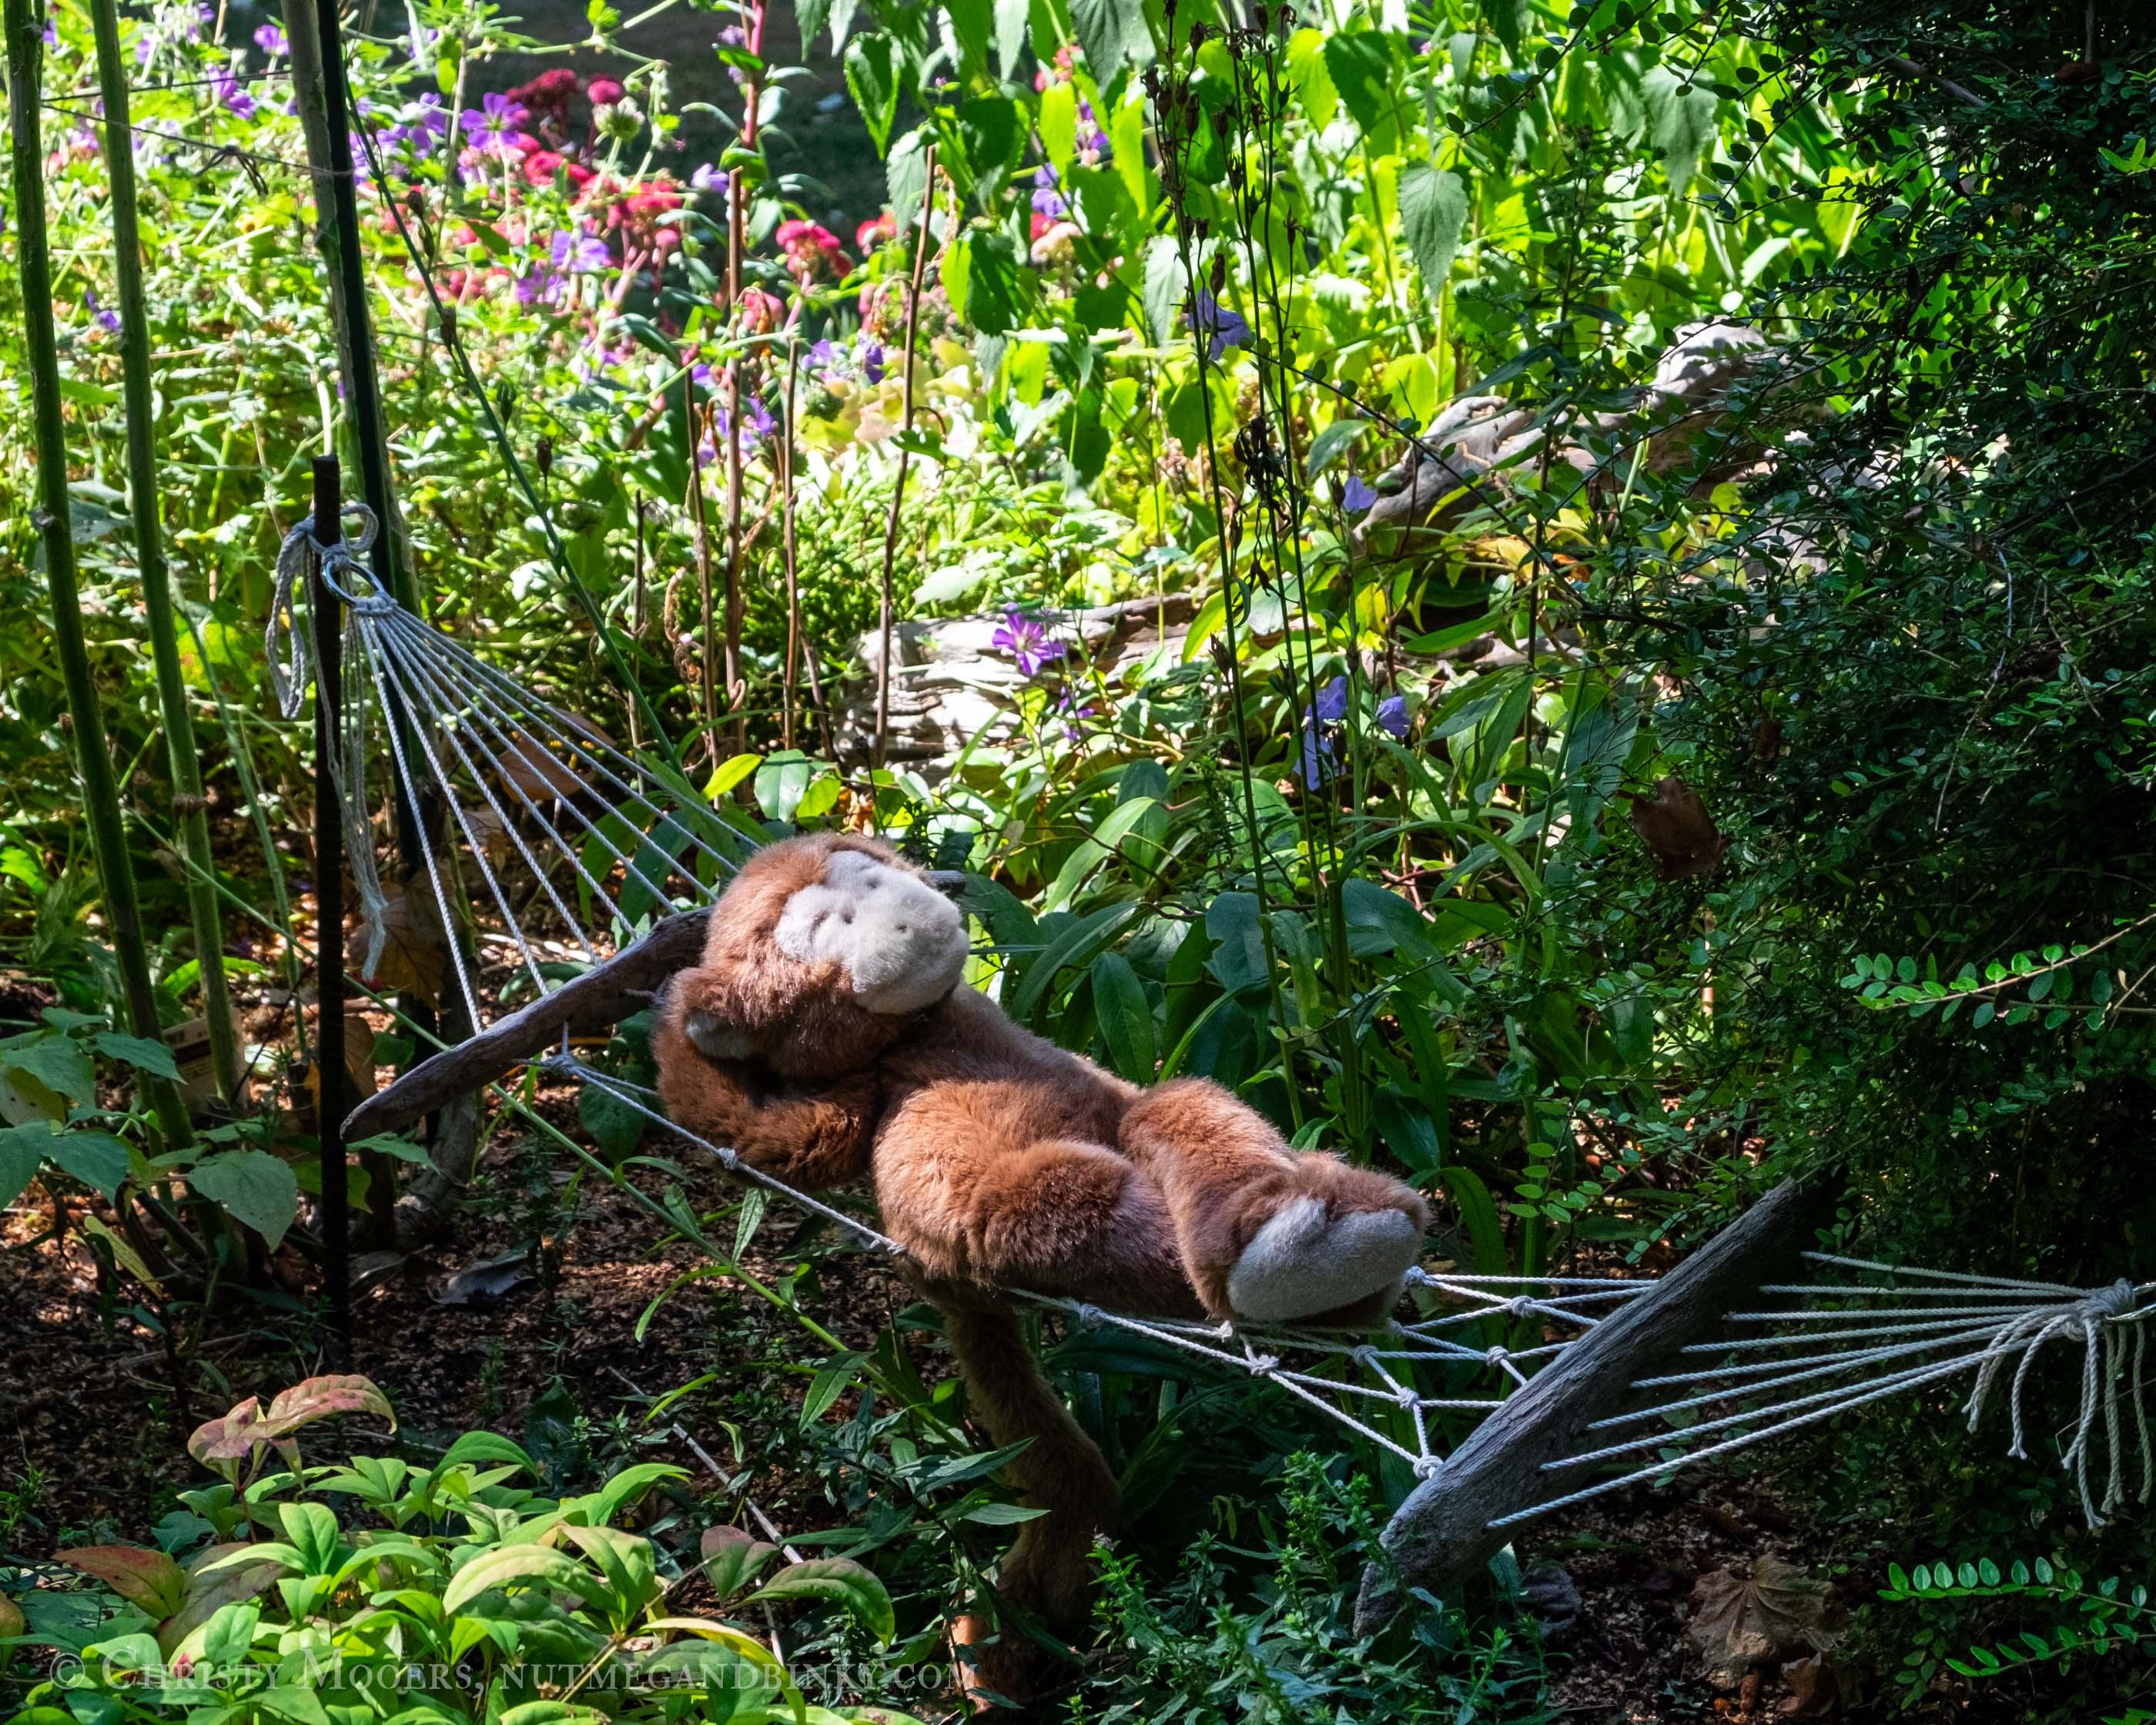 stuffed animal monkey swinging in a tiny hammock in a lush garden